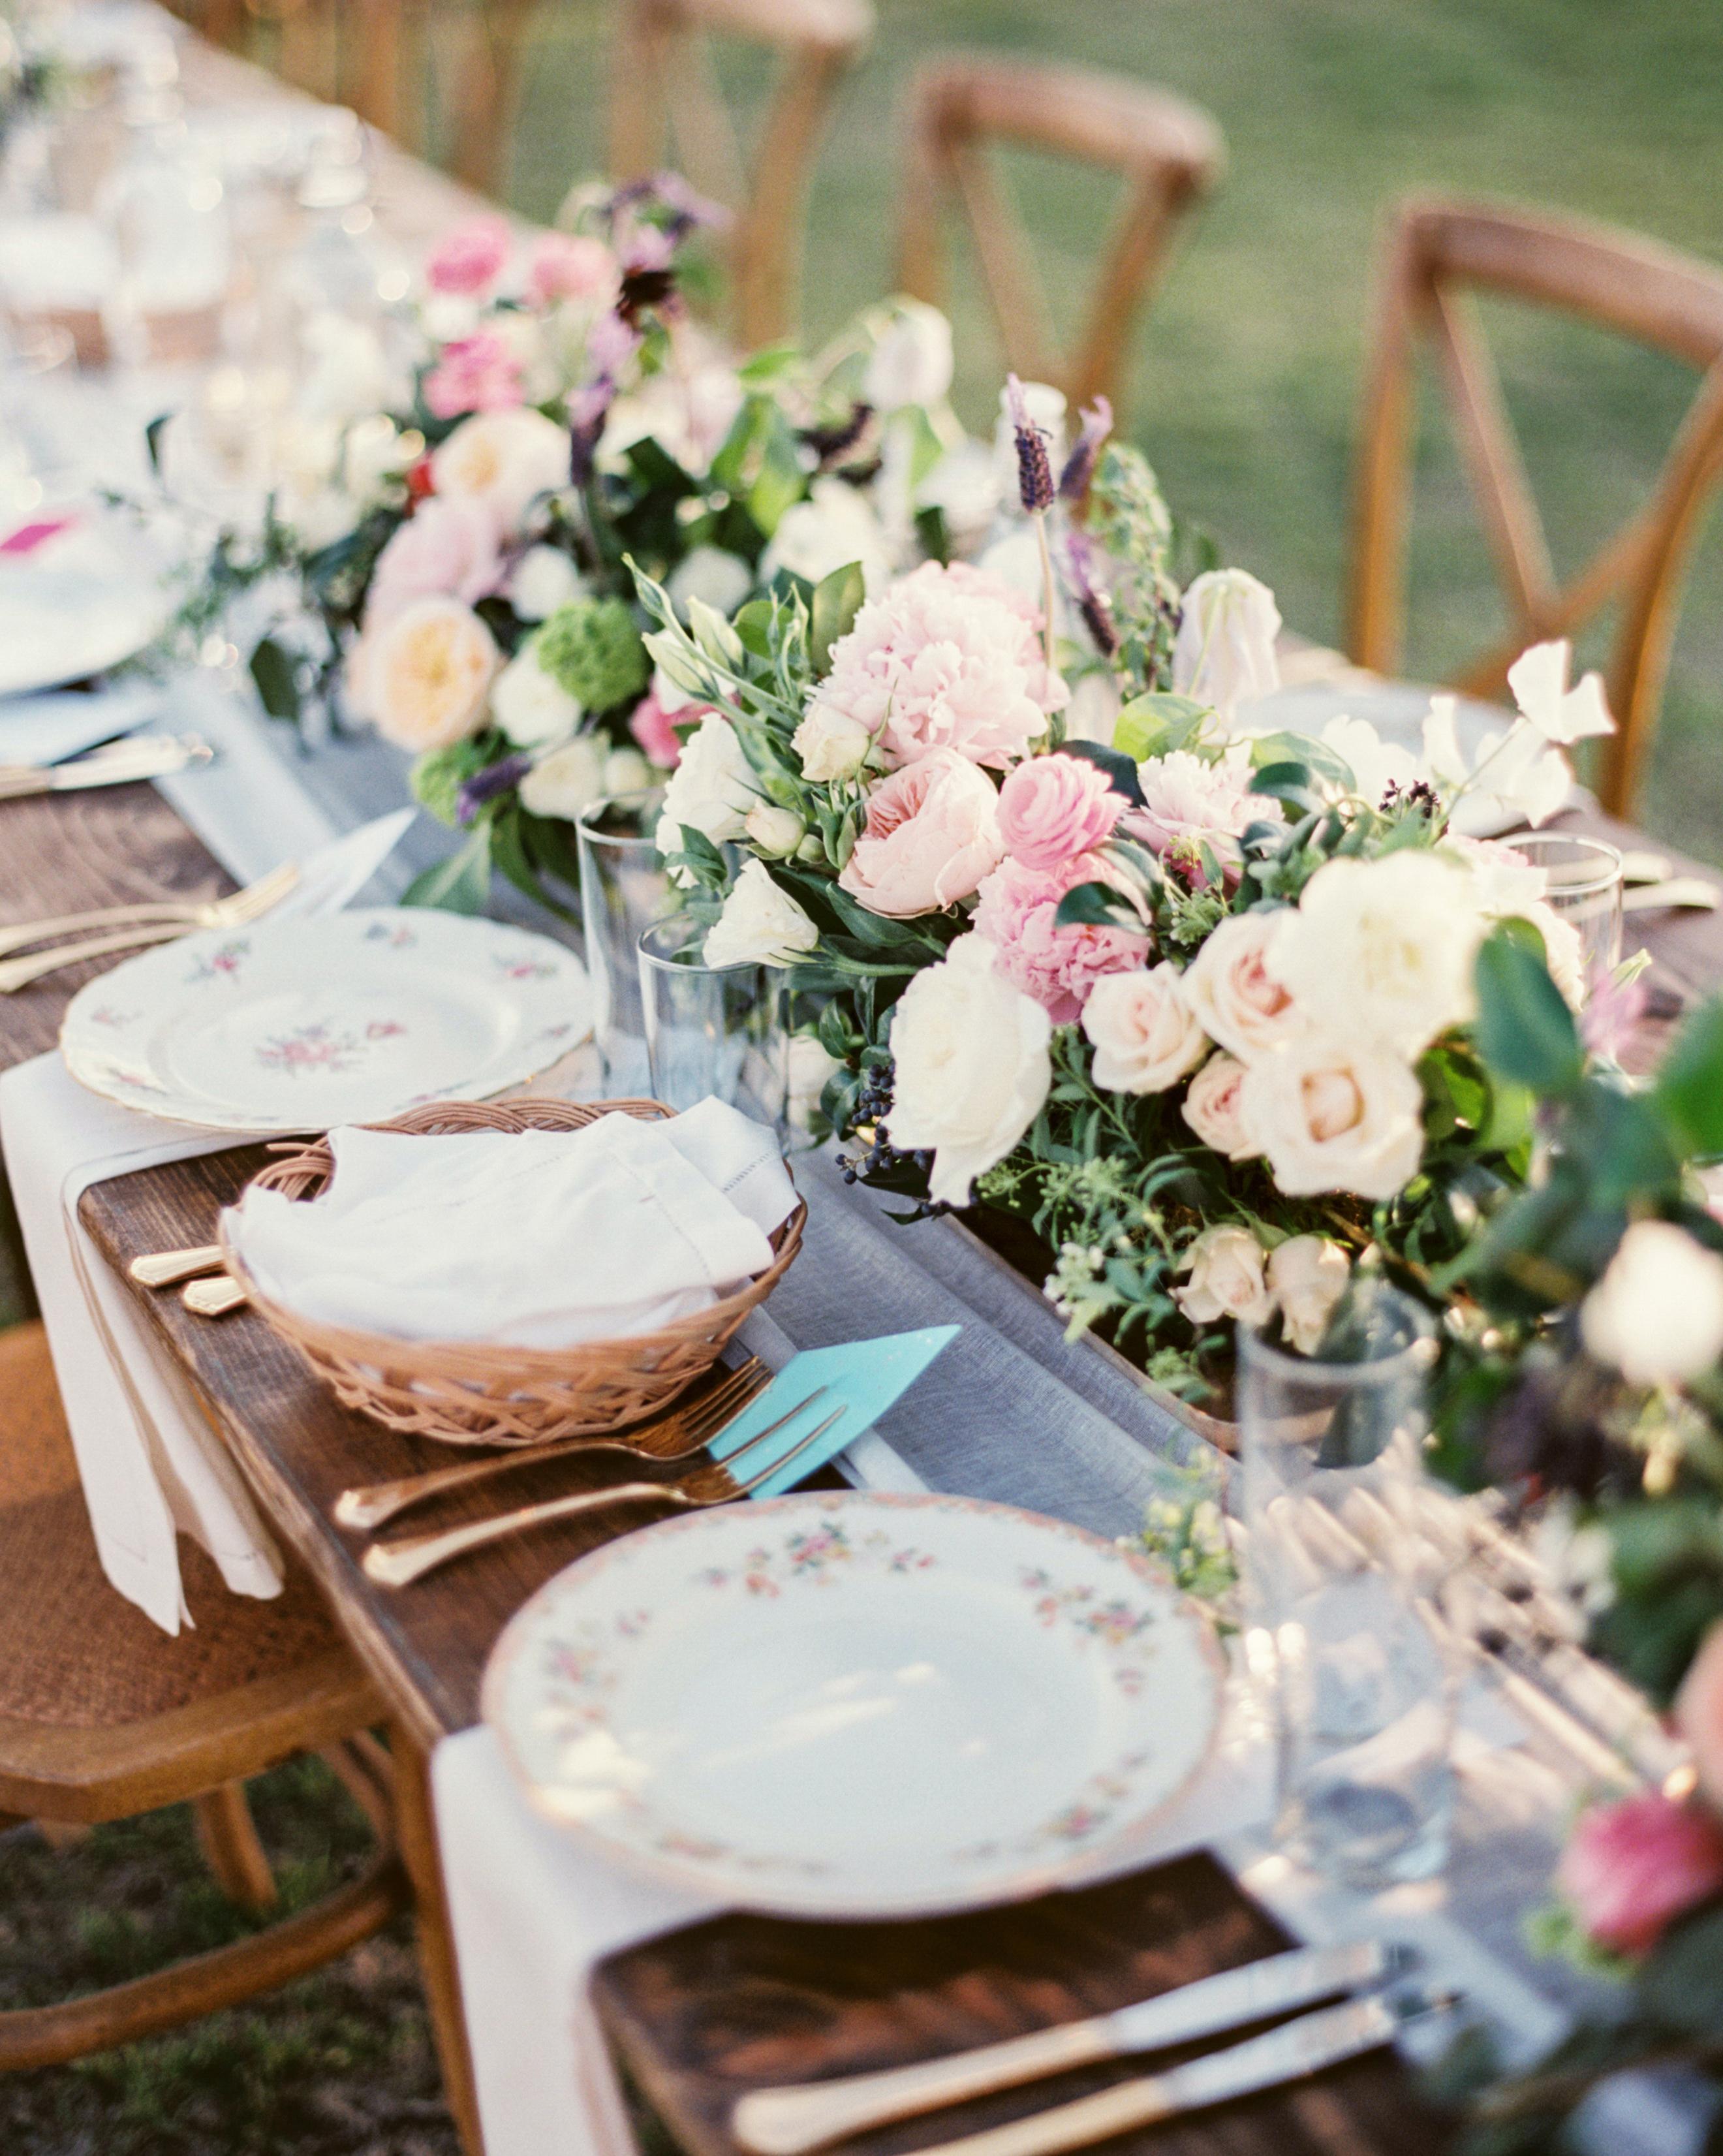 paige-chris-wedding-suite-107-s111485-0914.jpg